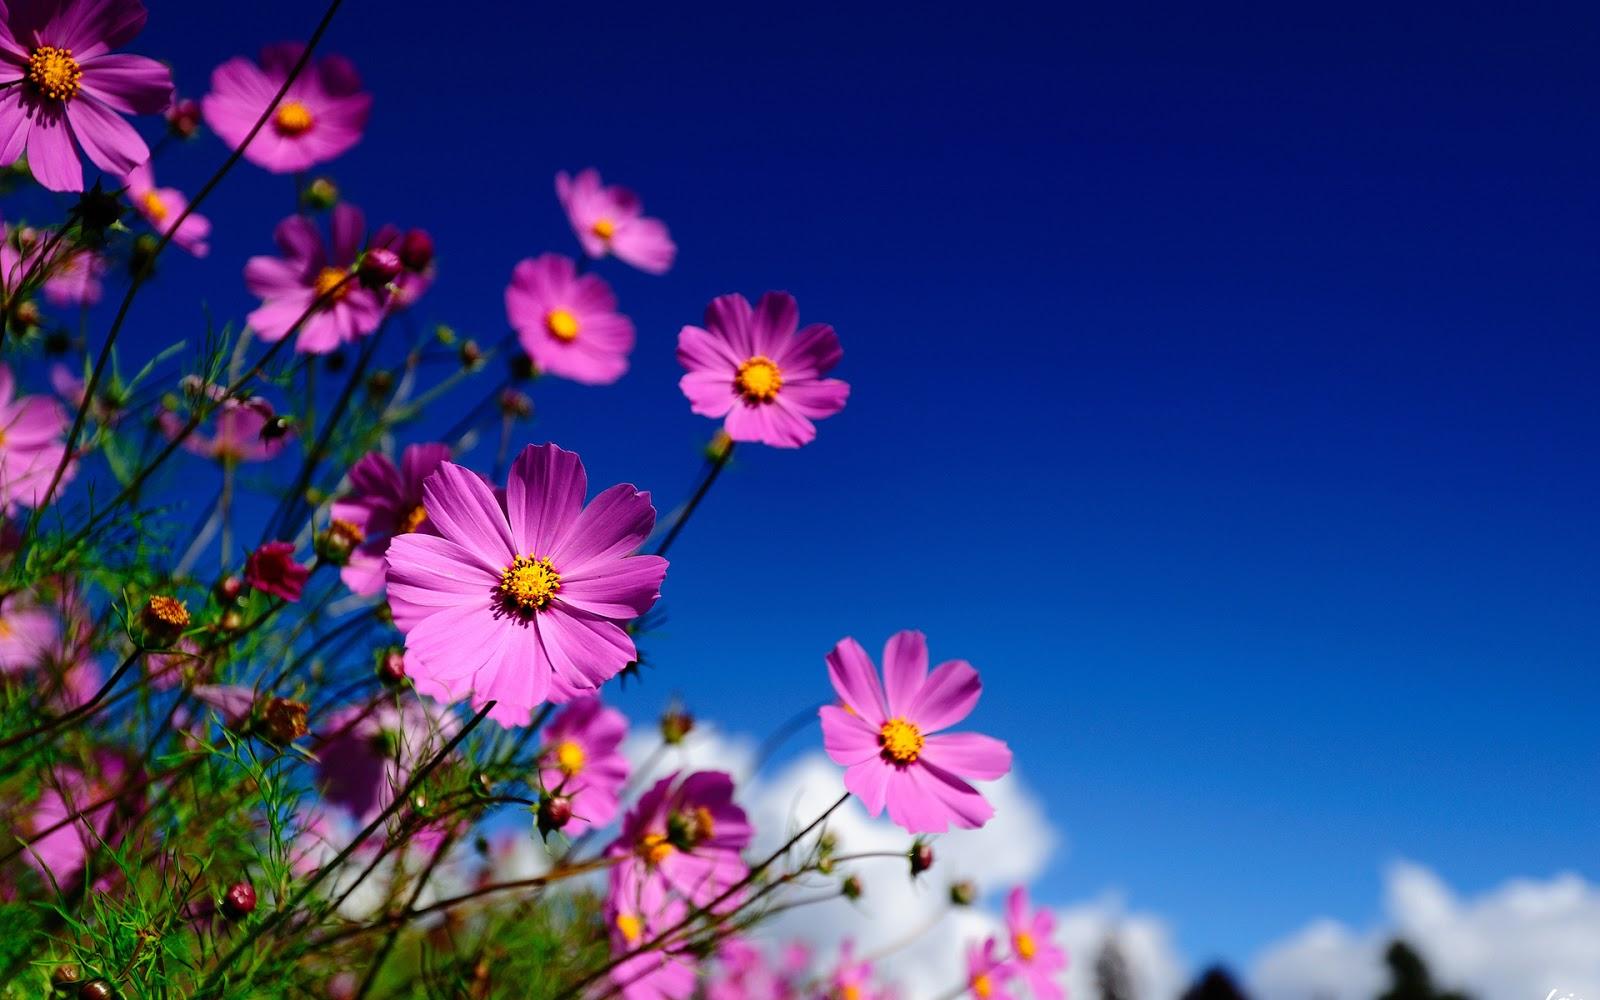 Desktop HD Wallpapers: Desktop Flowers Wallpapers HD